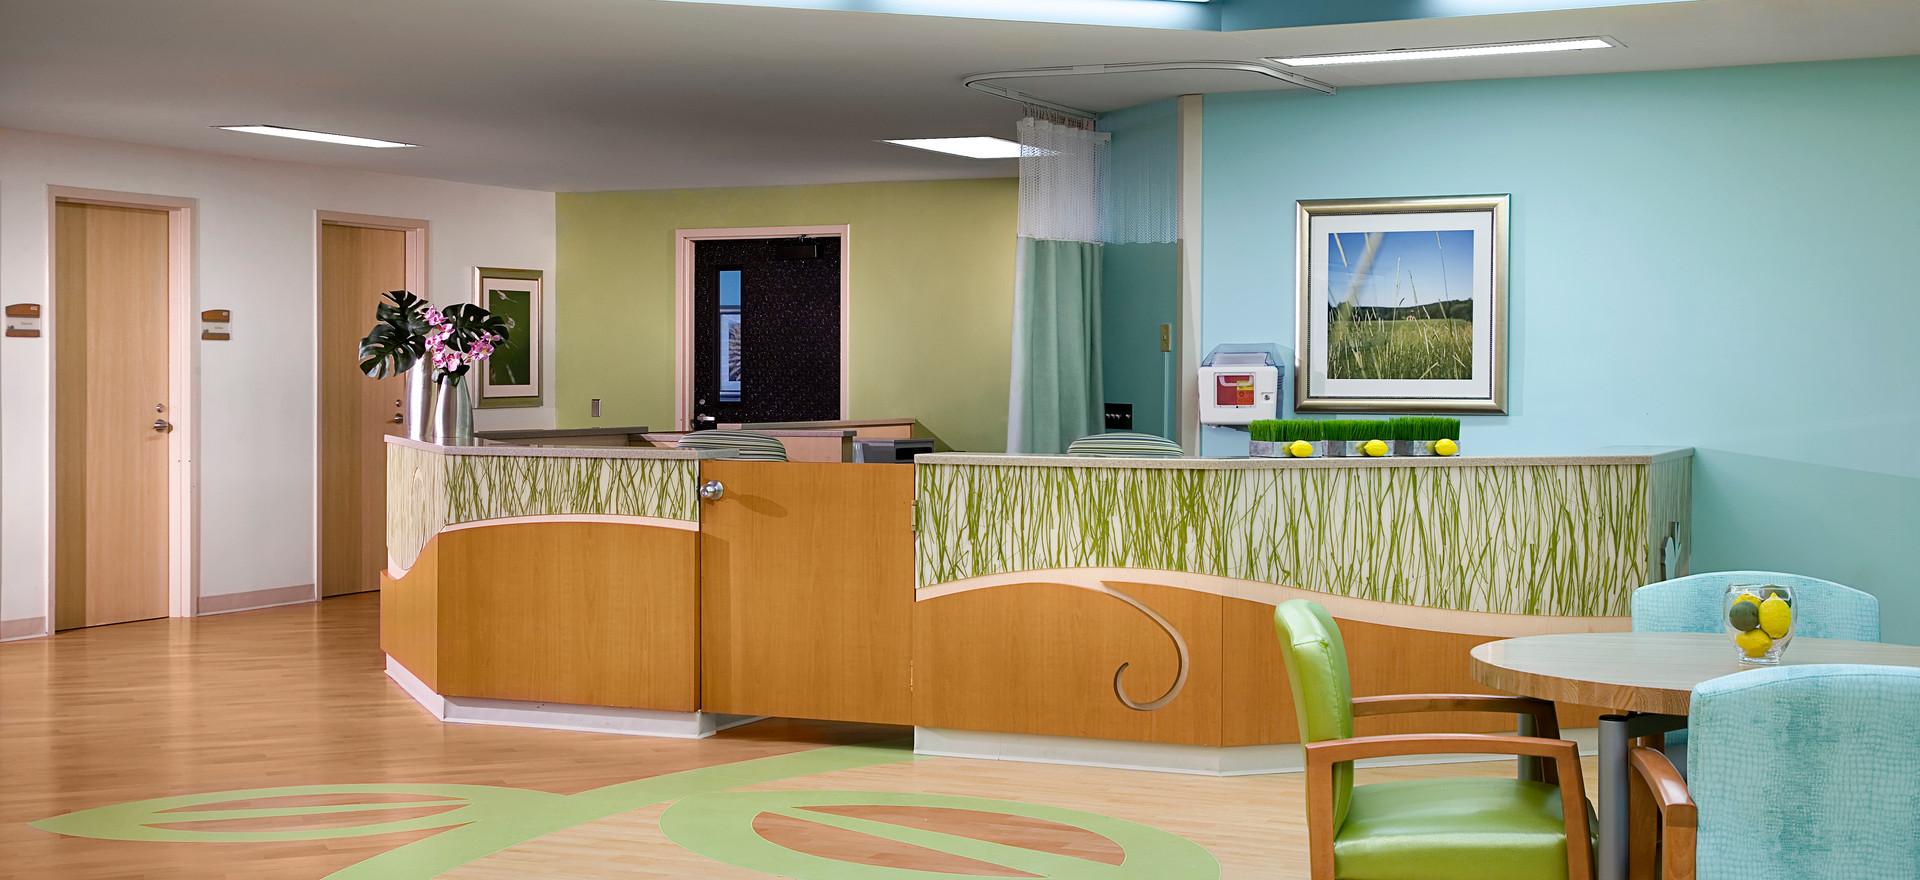 Cumberland Children's Hospital